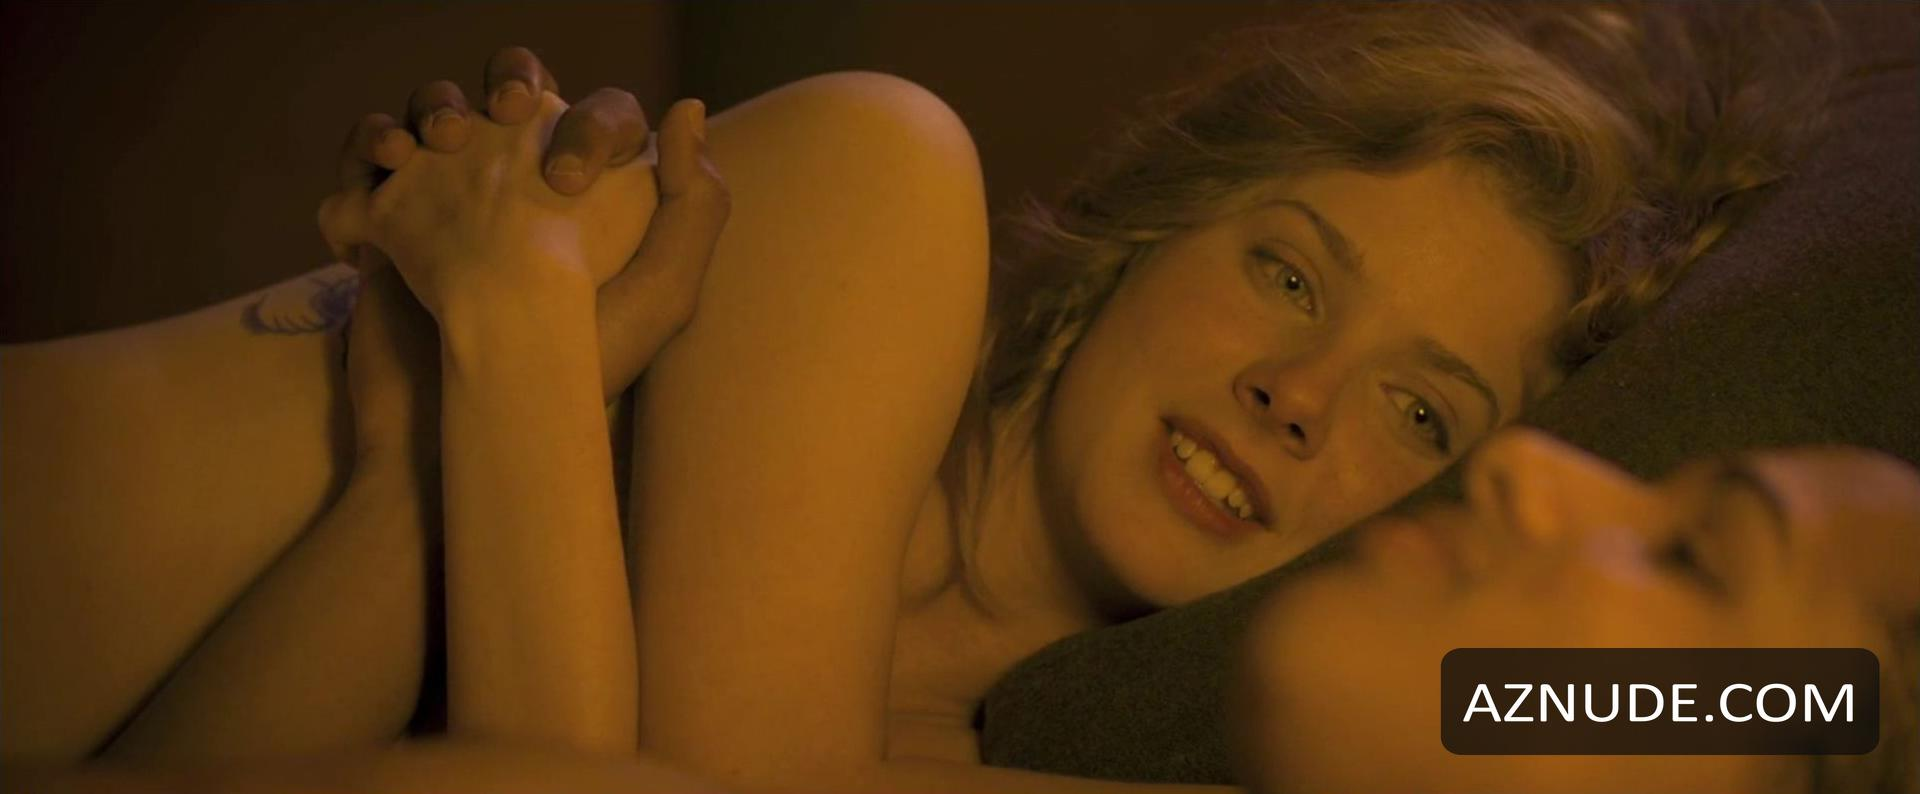 natalie martinez nude pictures